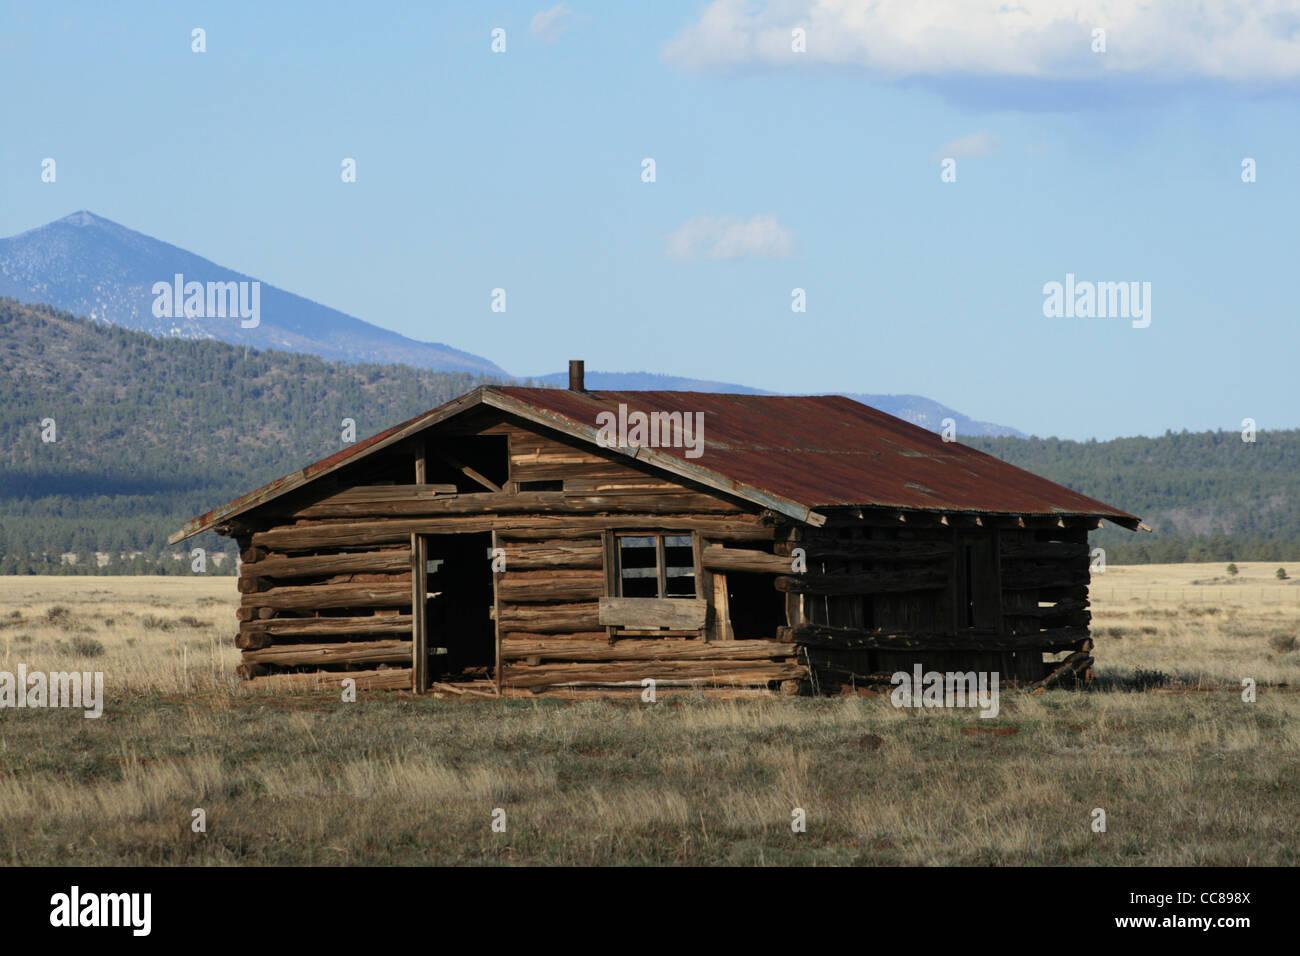 rundown old log cabin in field in northern Arizona - Stock Image